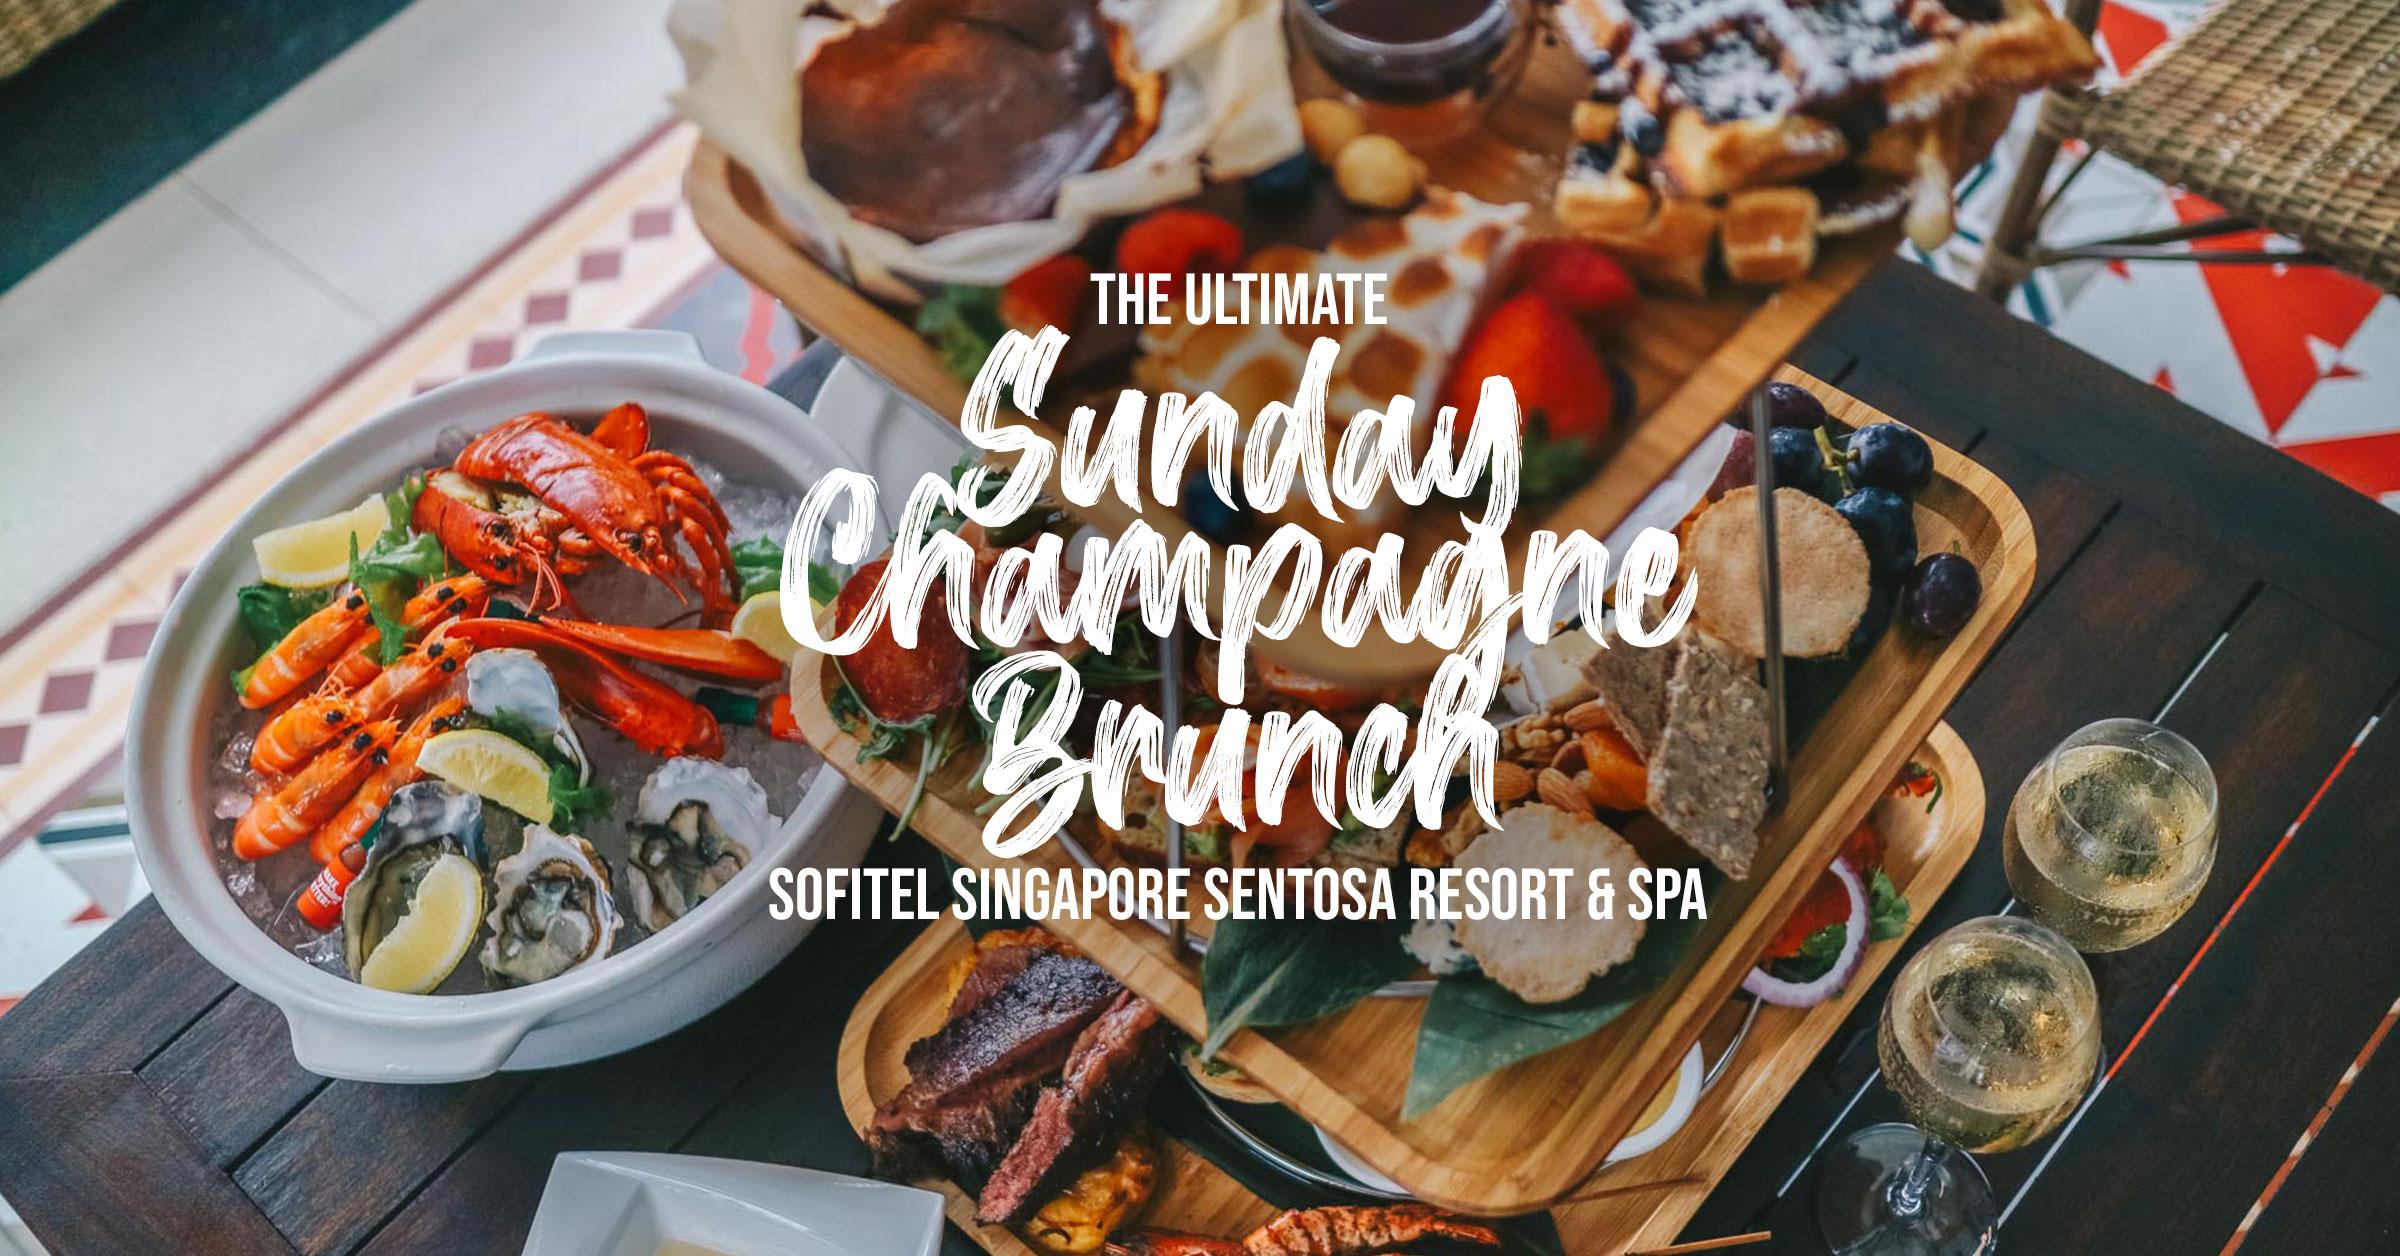 The-Ultimate-Sunday-Brunch-Sofitel-Singapore-Sentosa-darrenbloggie_featured